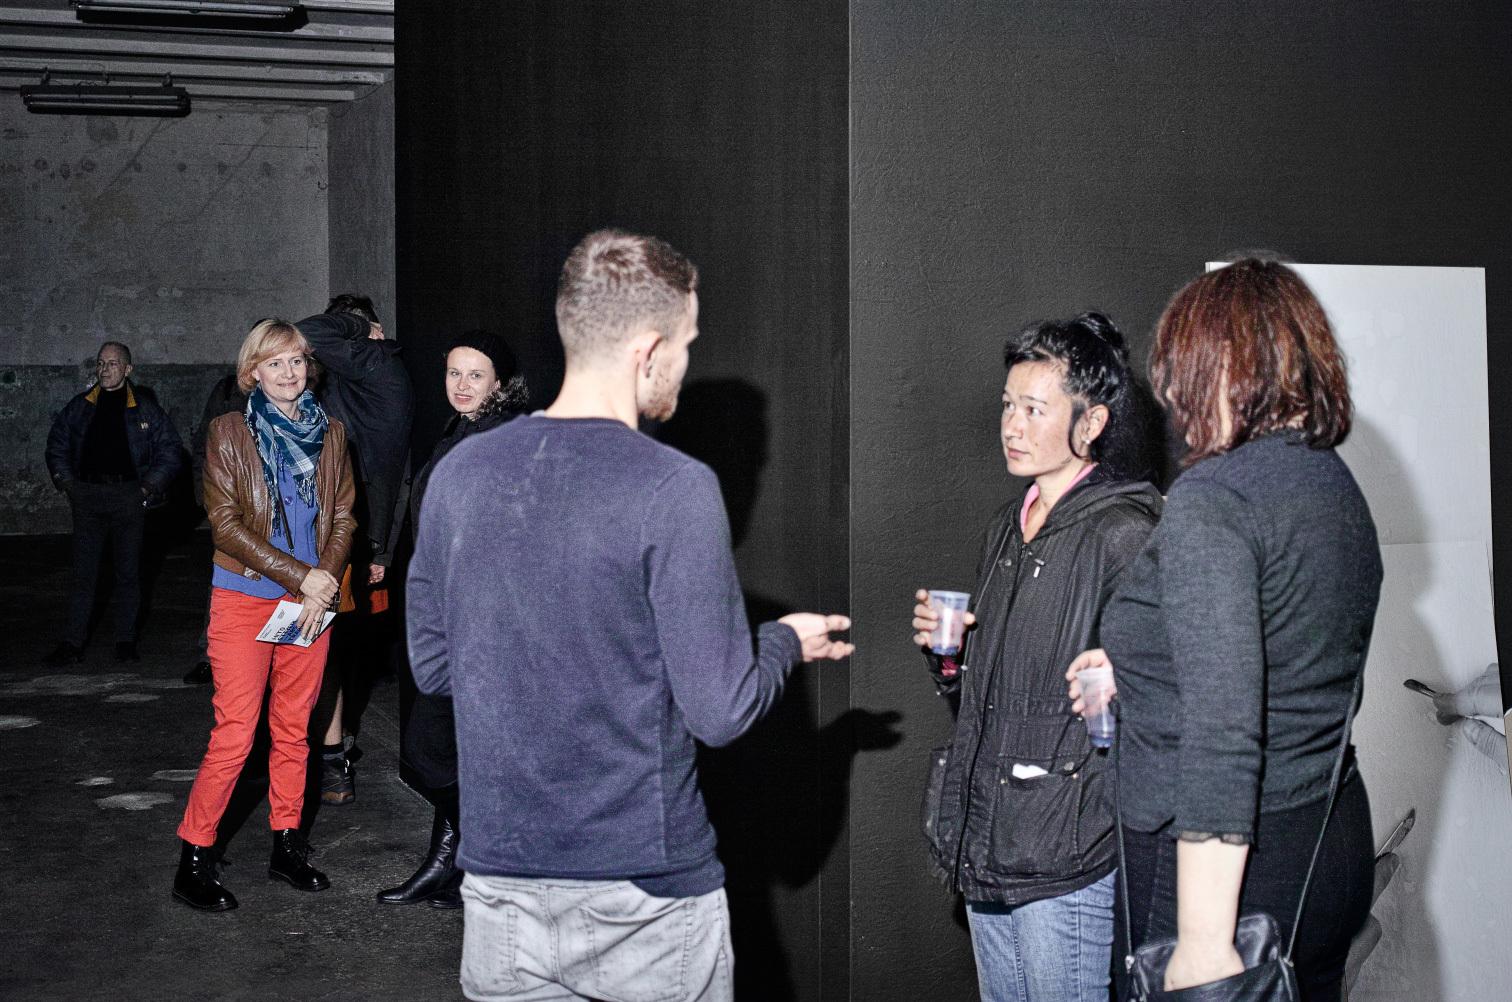 Hito Steyerl, Abstrakt, otwarcie wystawy